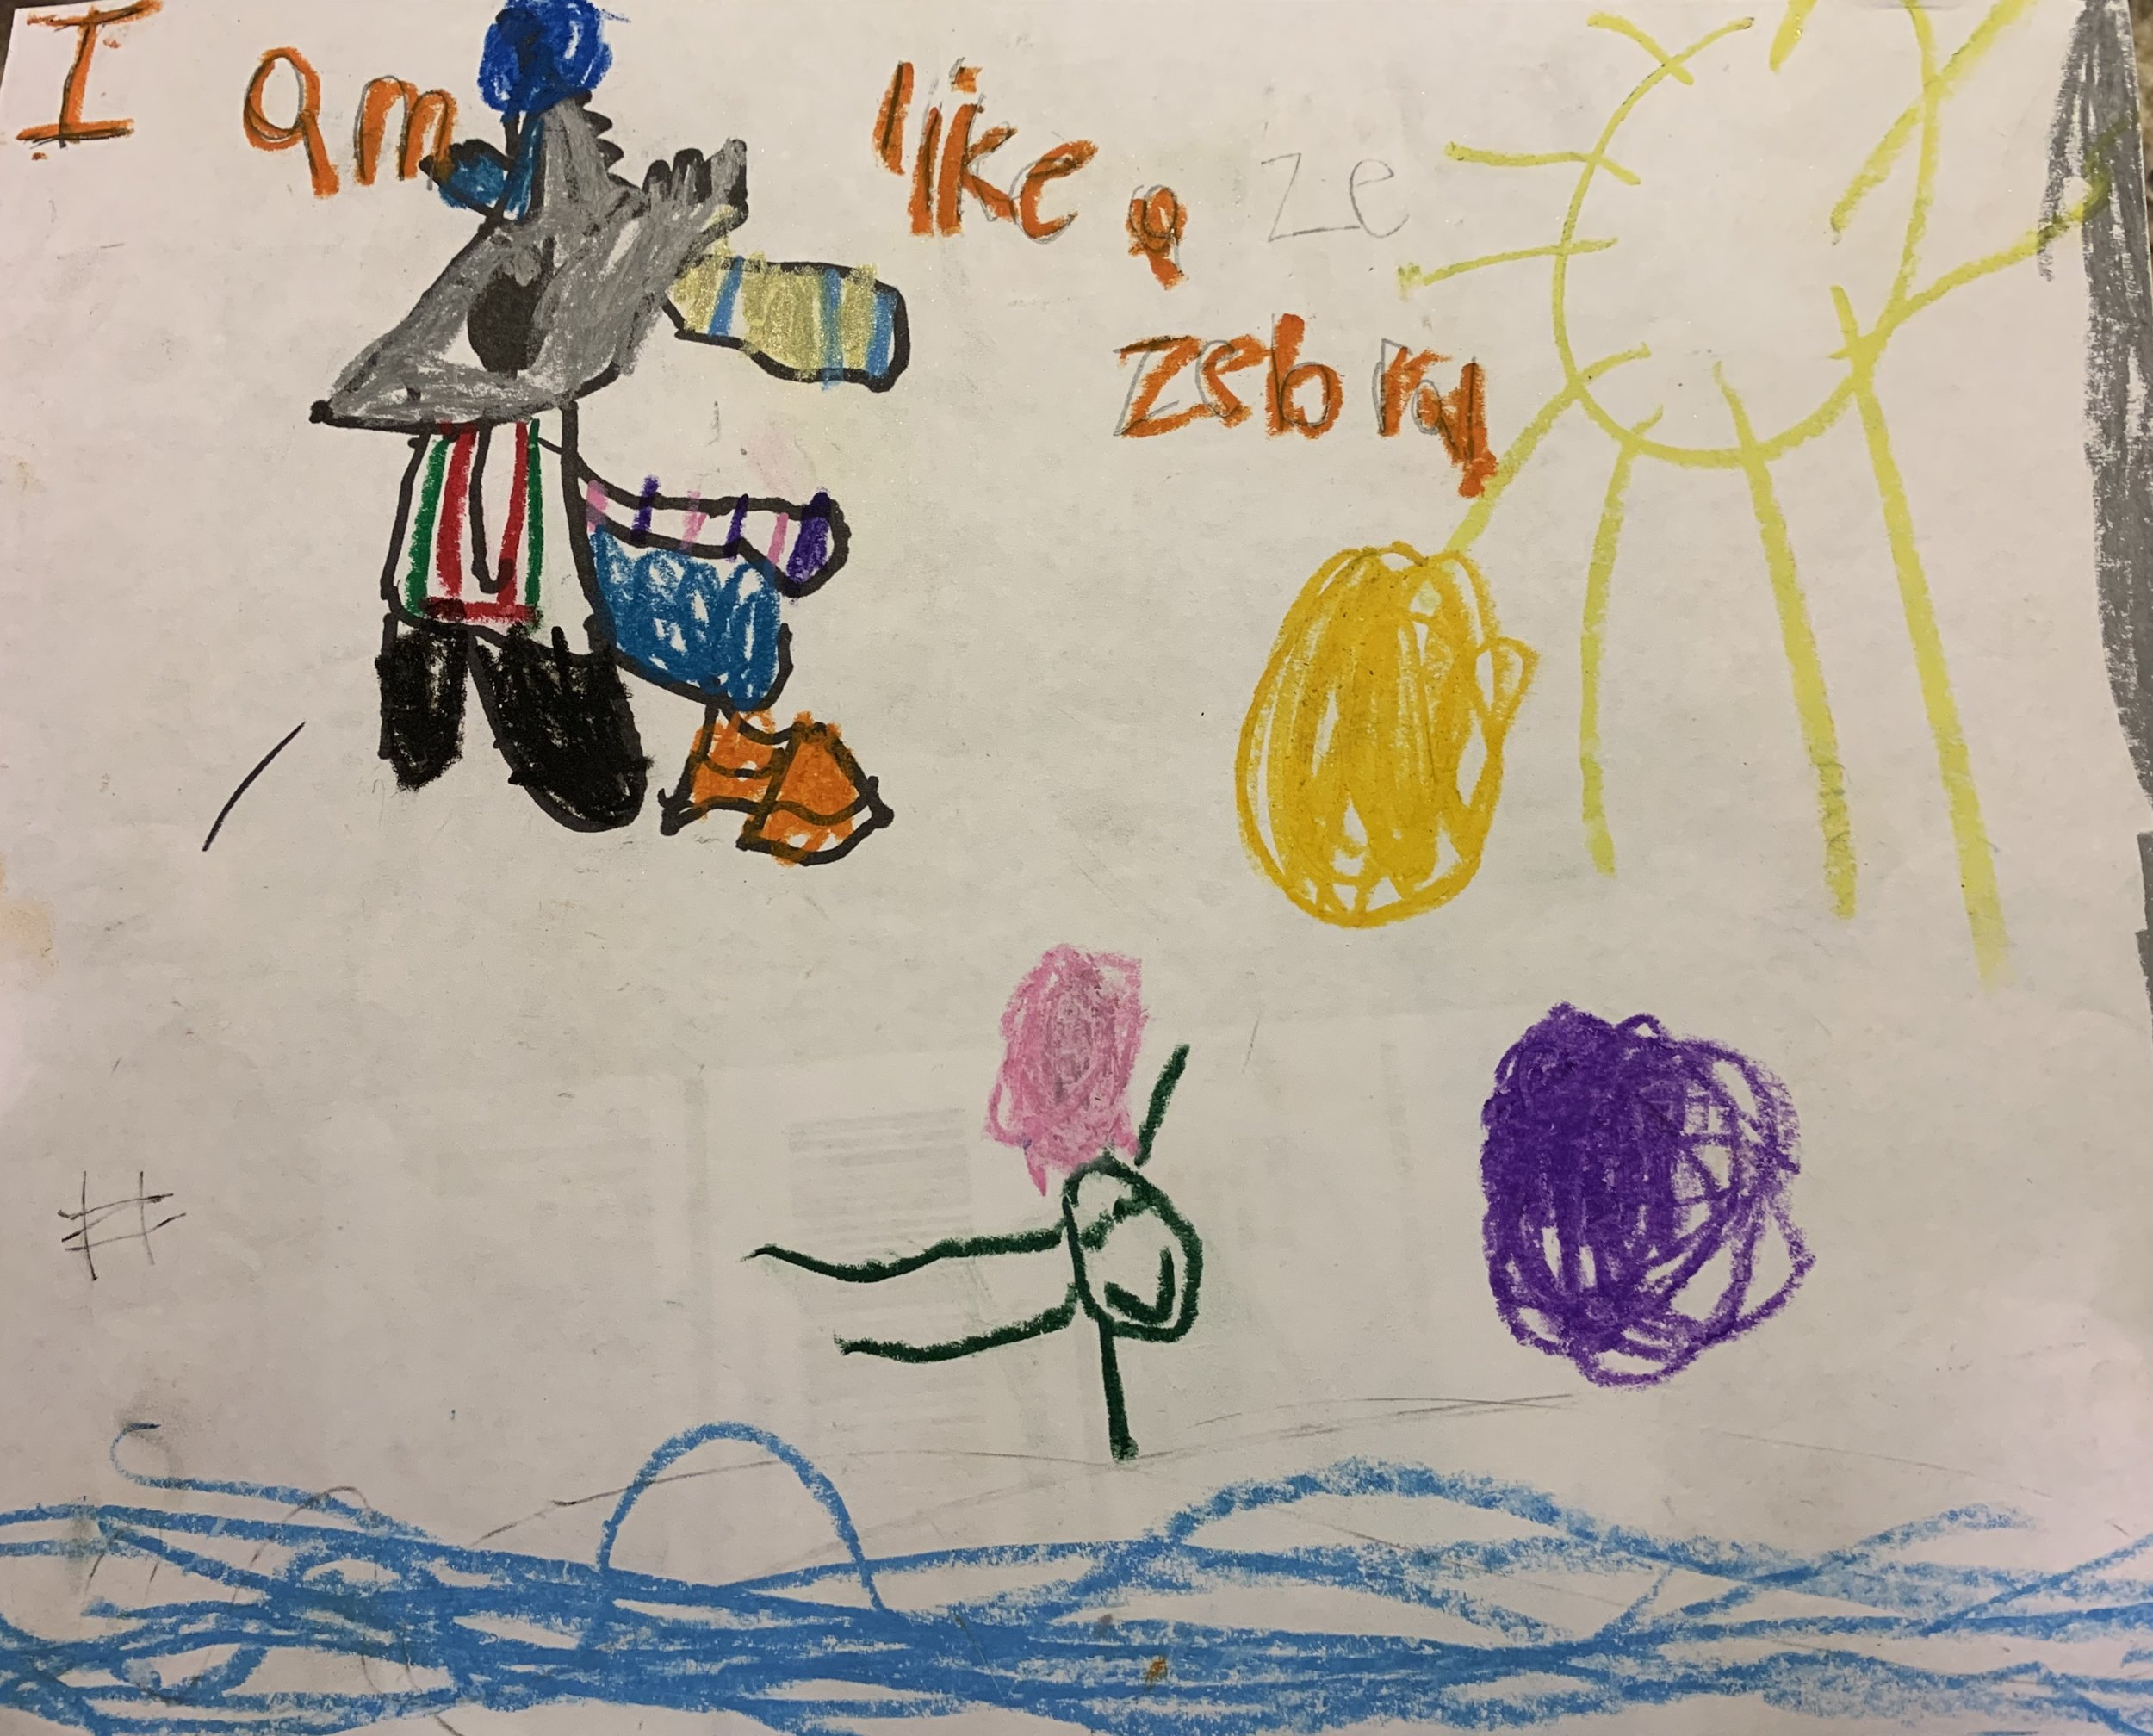 010 - I AM LIKE A ZEBRA by Hazel Birch (age 5.5) in Charlotte, North Carolina, USA